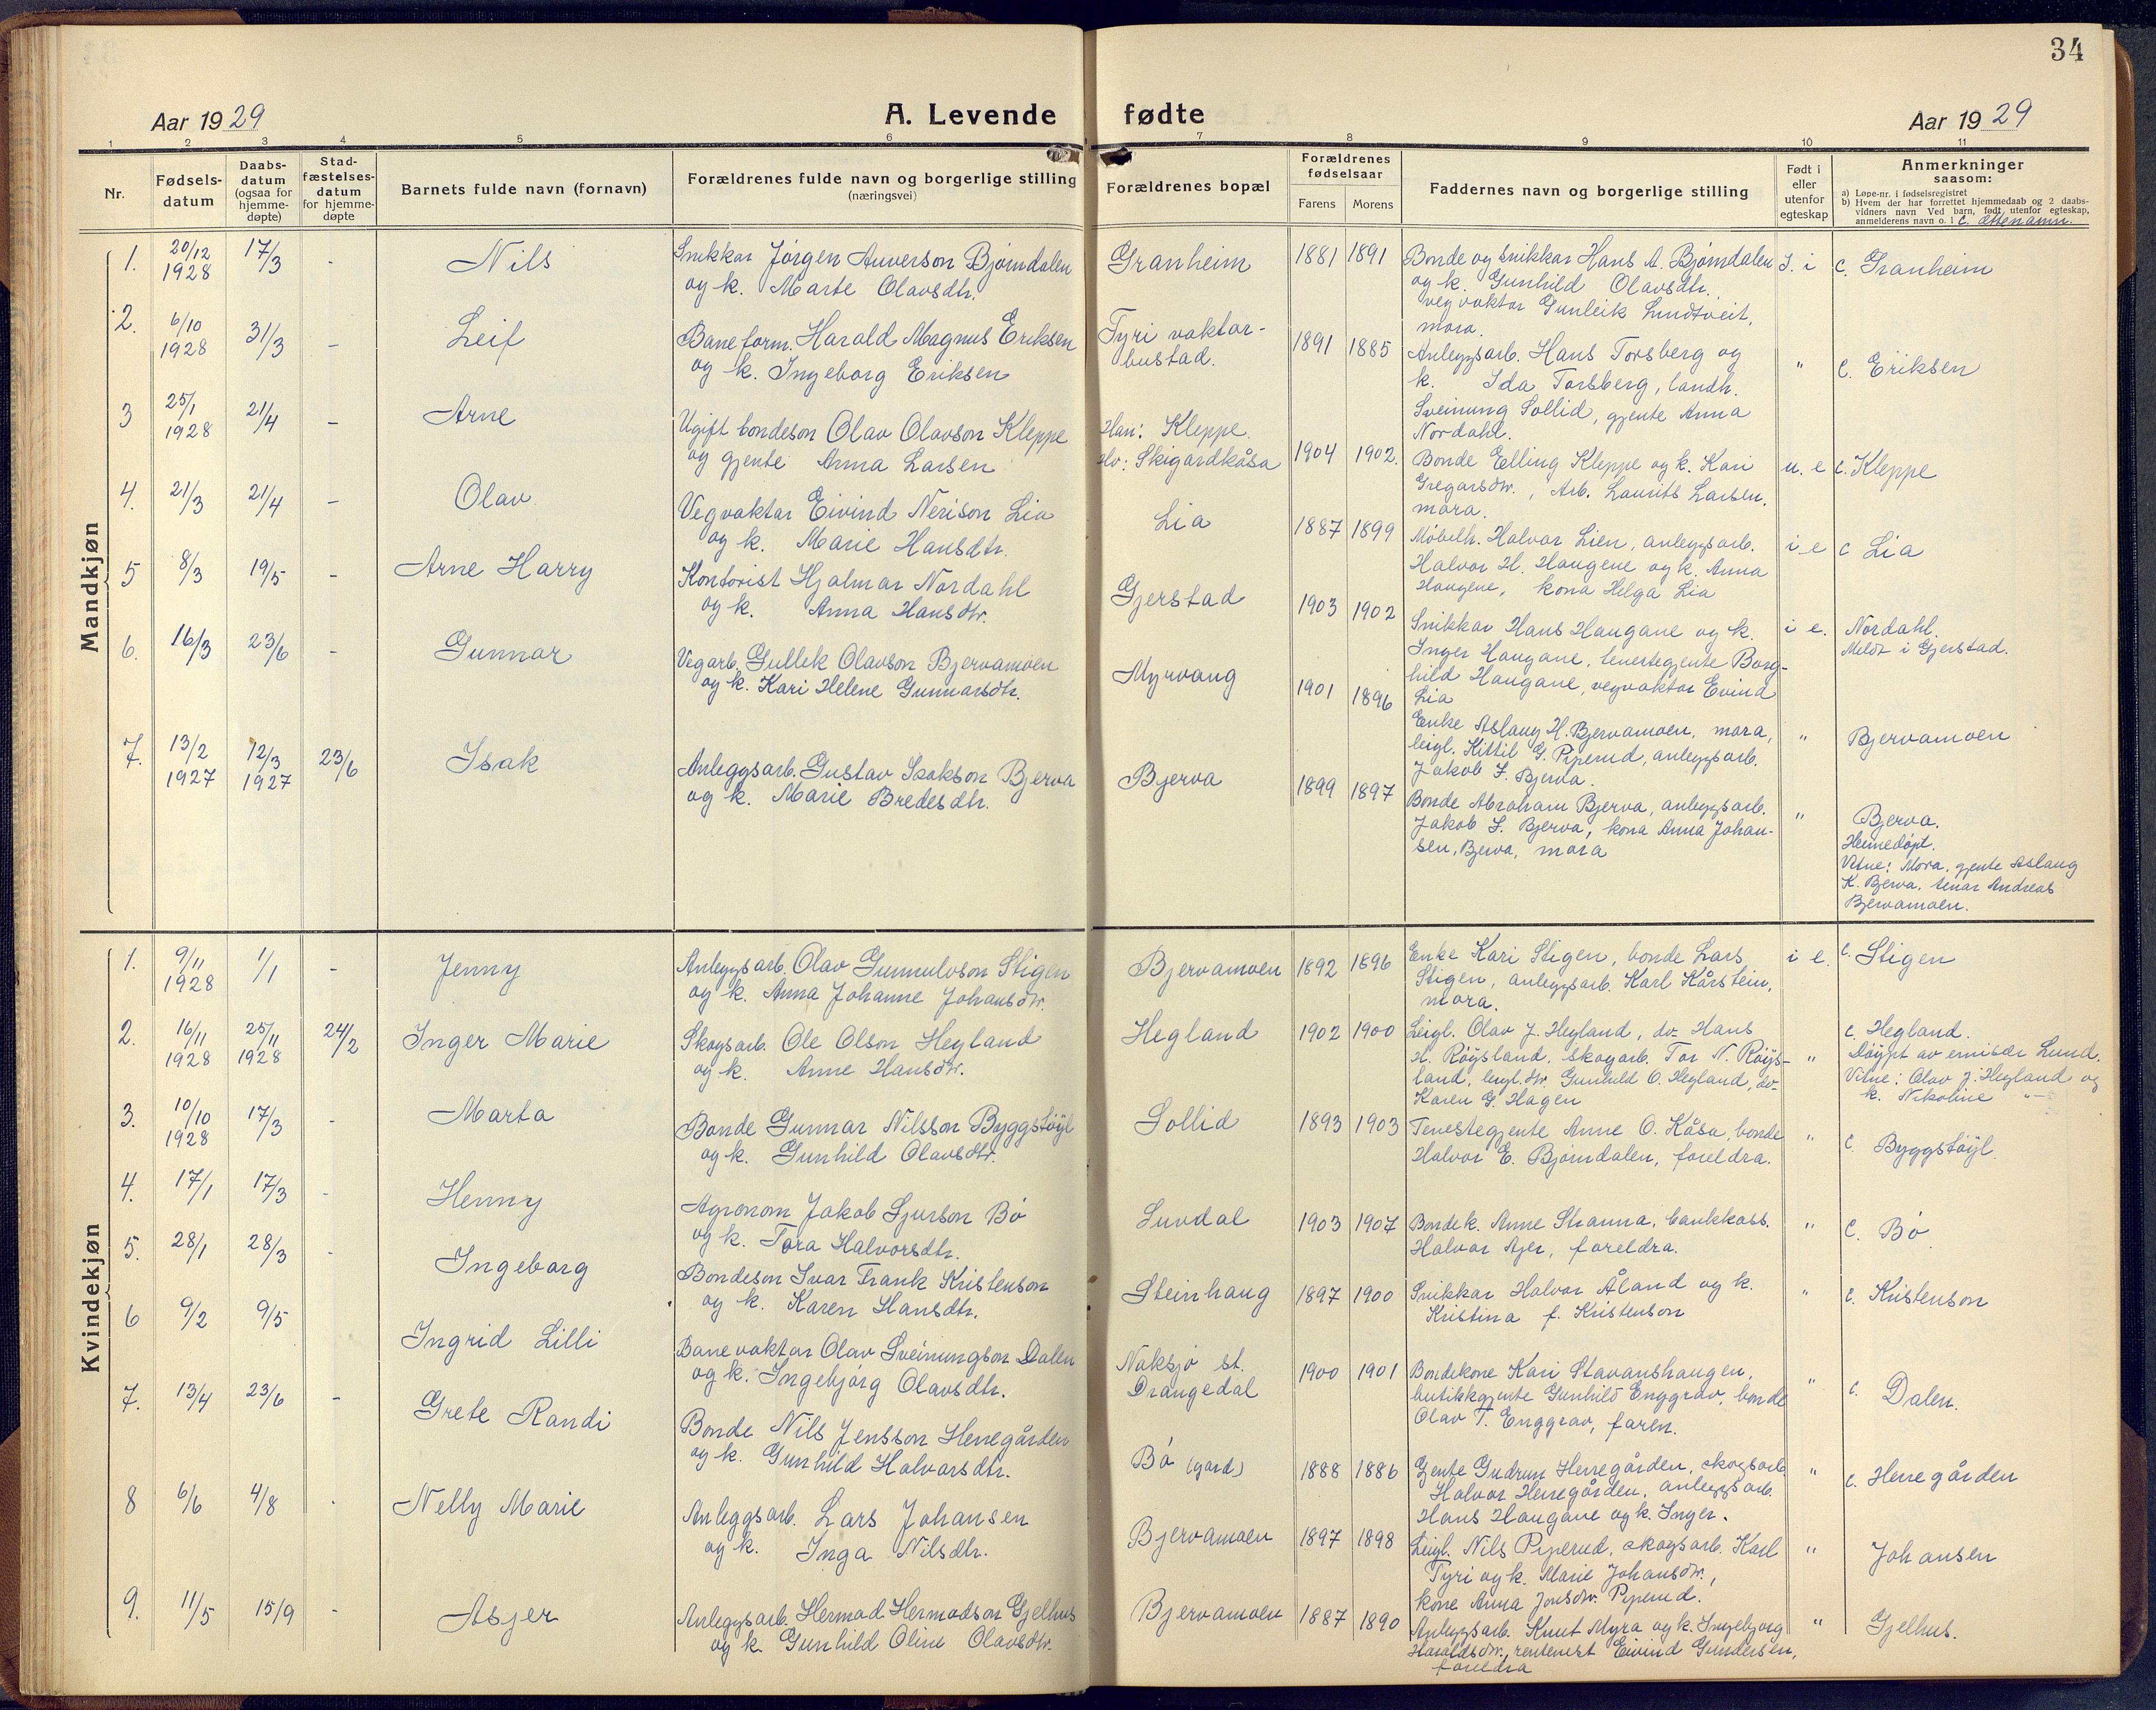 SAKO, Lunde kirkebøker, F/Fa/L0006: Ministerialbok nr. I 6, 1922-1940, s. 34